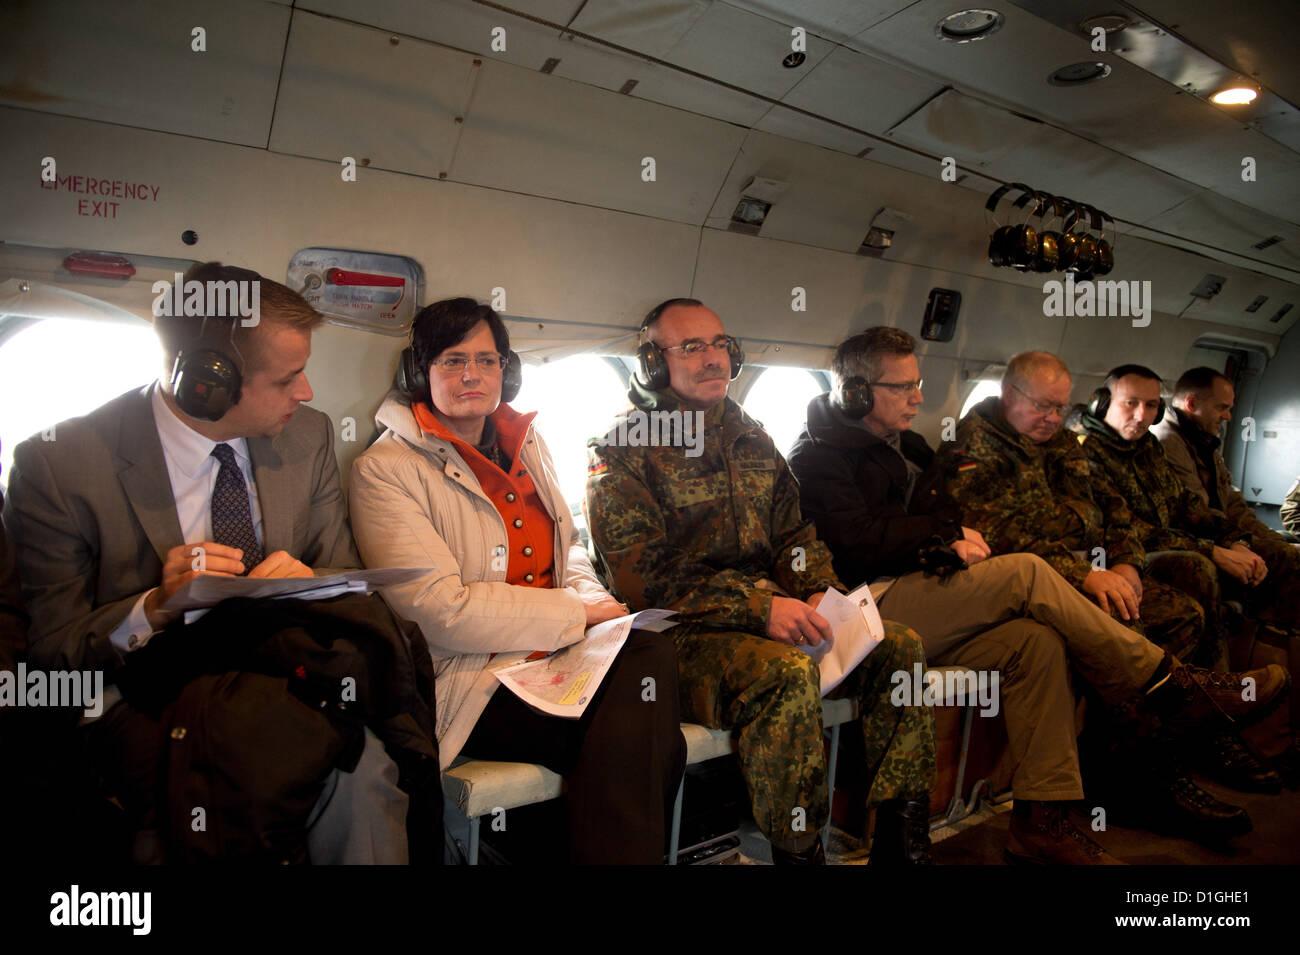 Thüringens Ministerpräsidentin Christine Lieberknecht (CDU, 2.v.l.) Und Verteidigungsminister Thomas de Stockbild